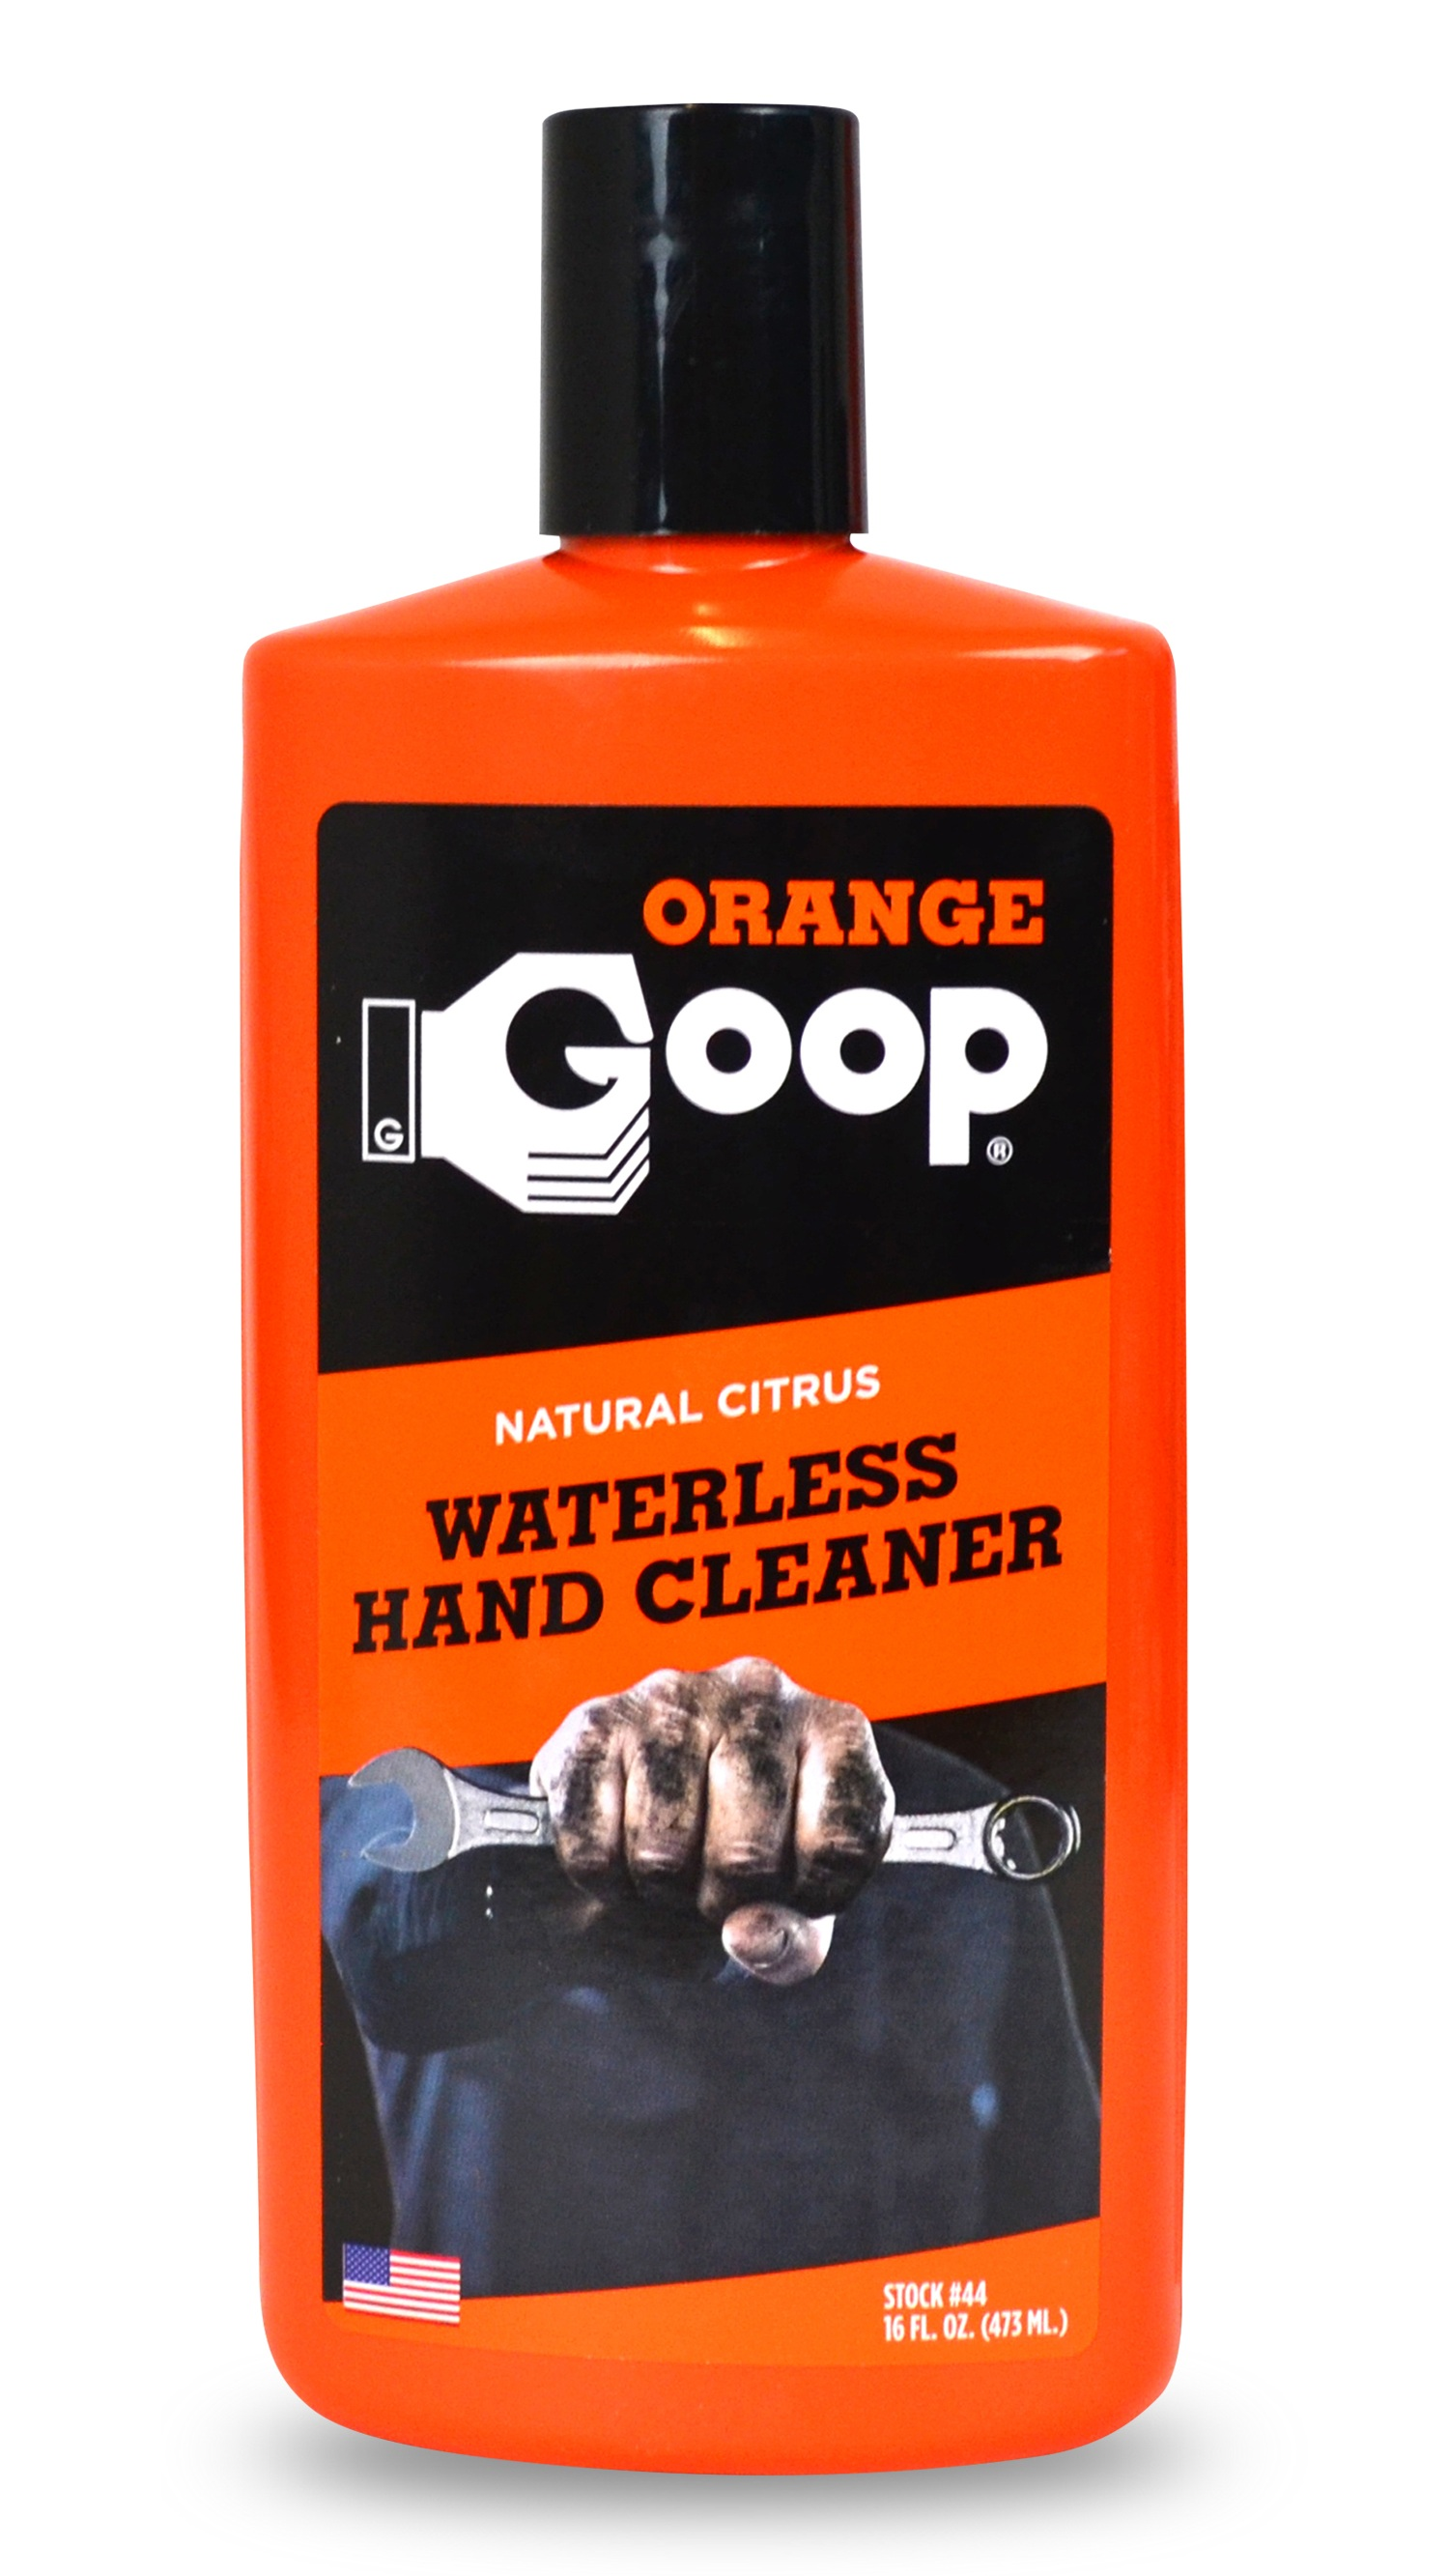 Moms-Goop-Orange-44-Bottle16oz.jpg